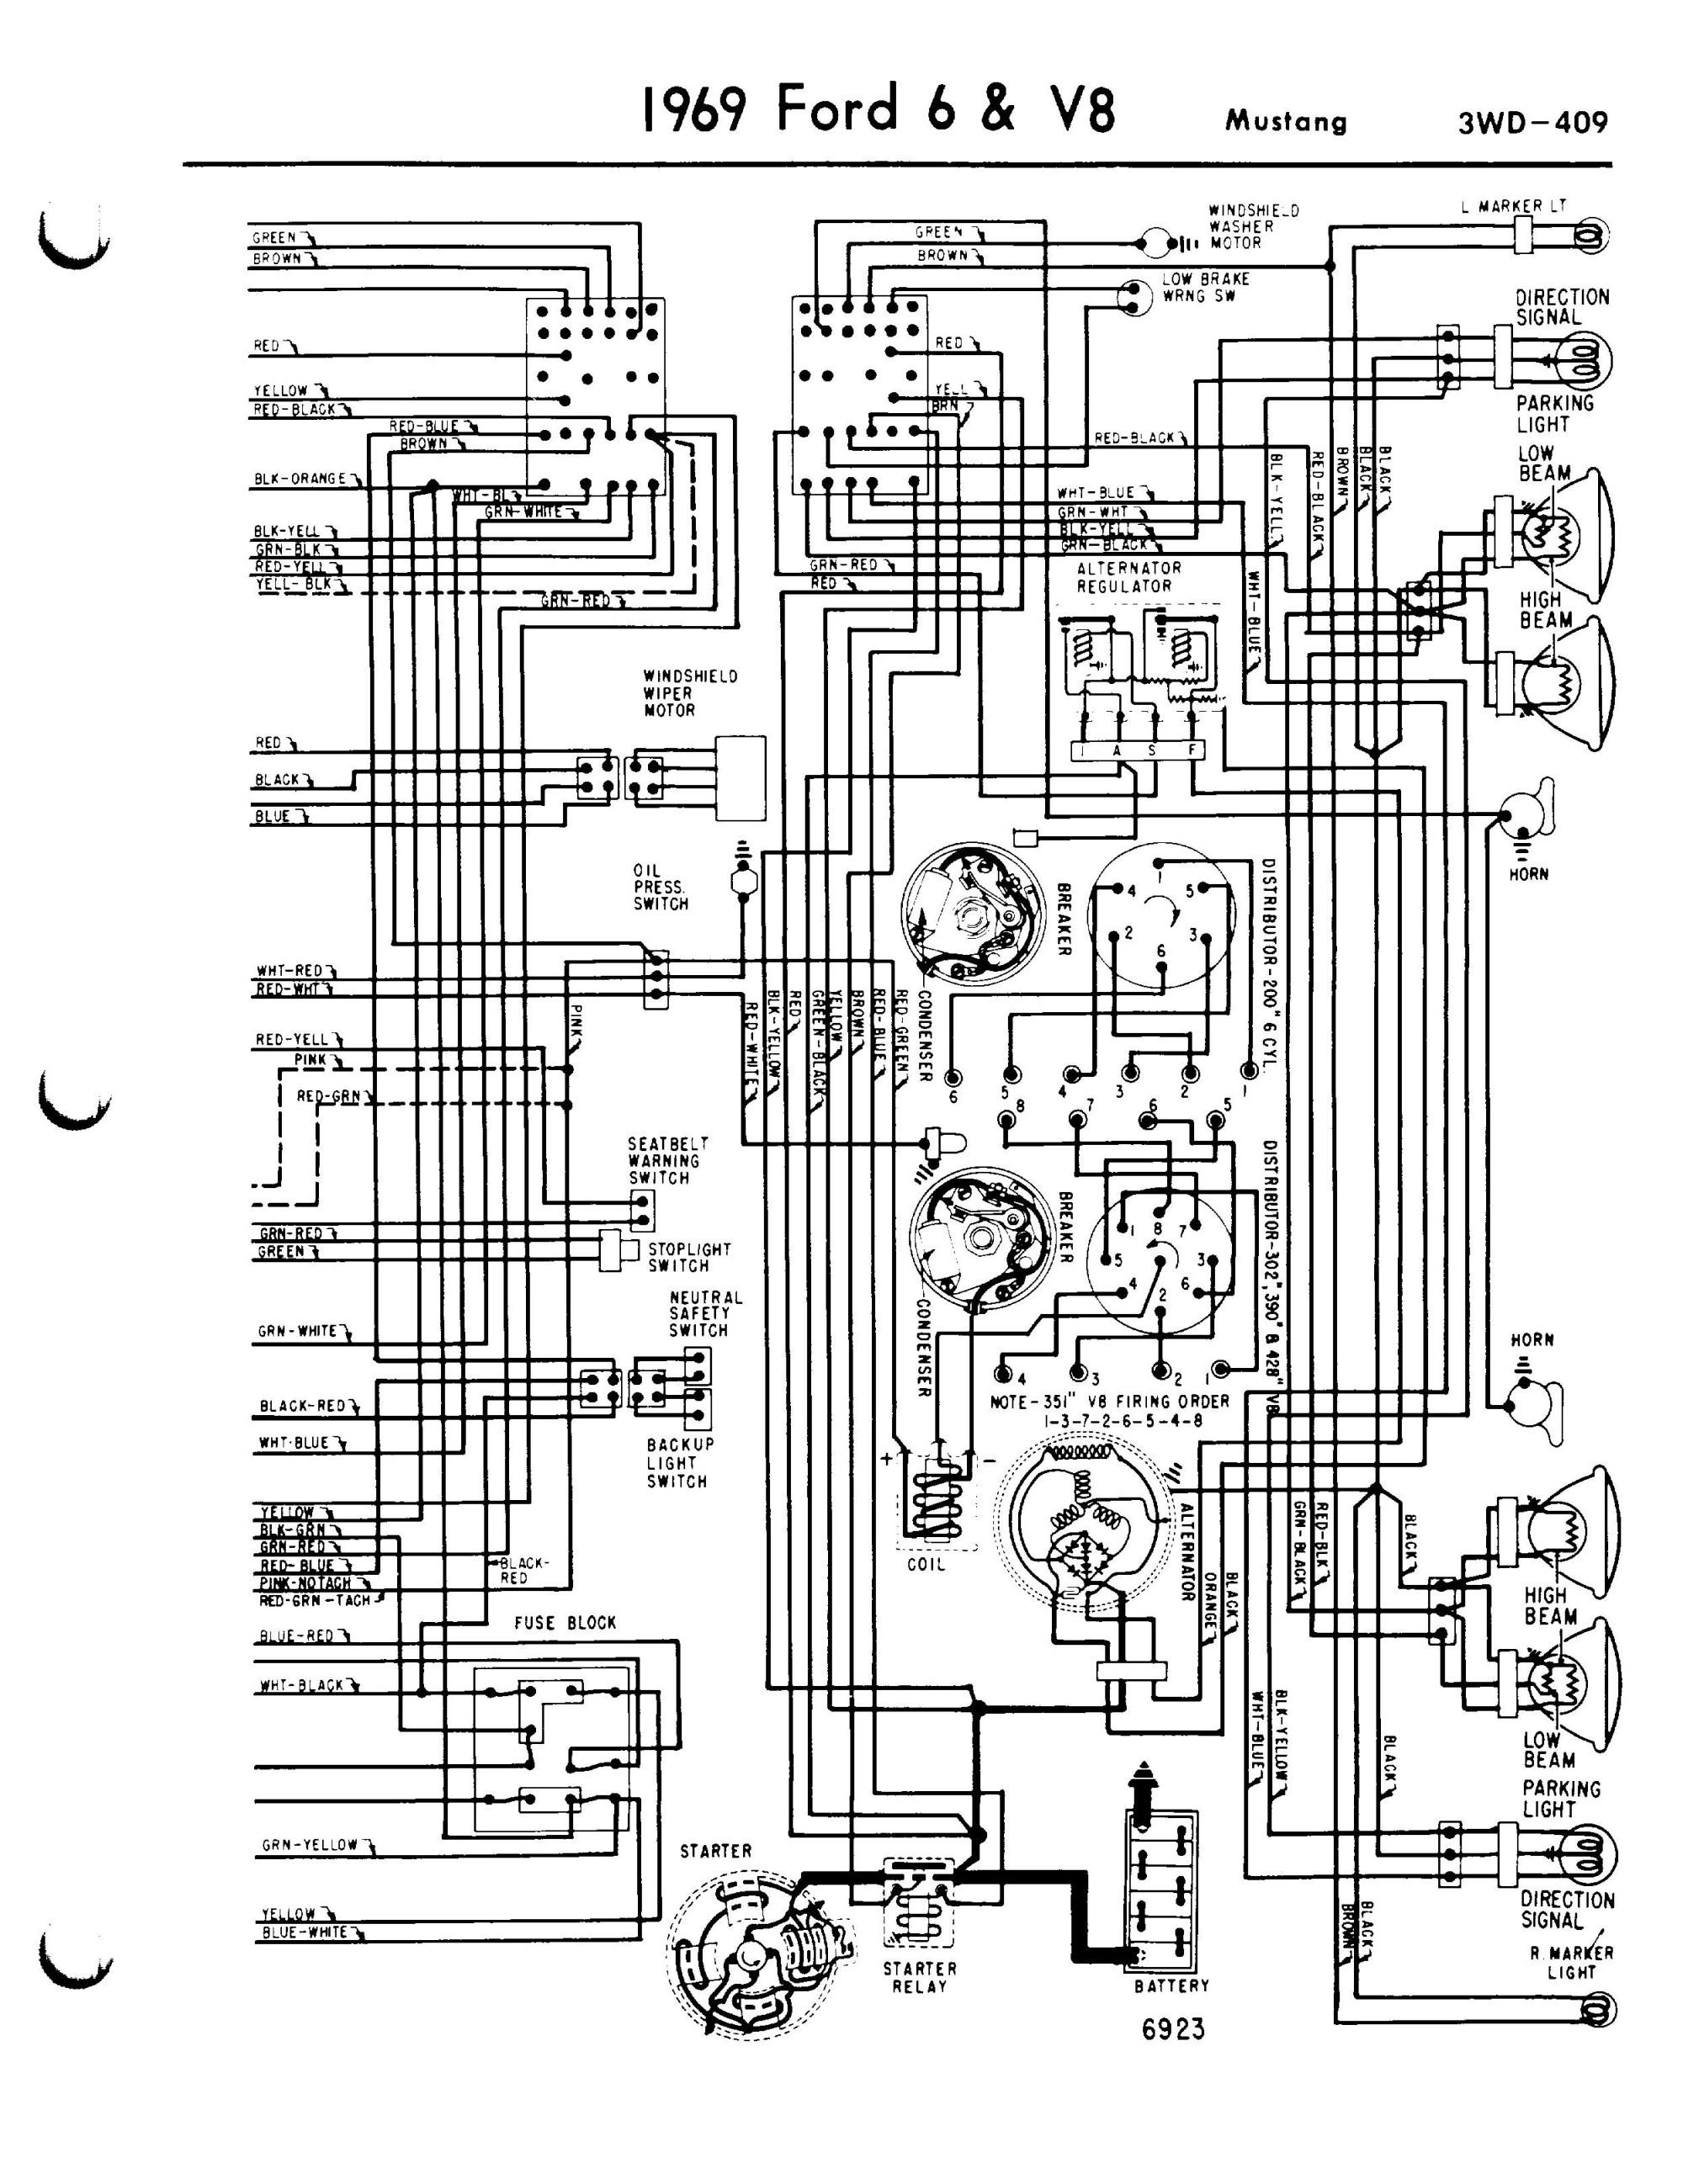 hight resolution of 1978 ford alternator wiring diagram u2022 wiring diagram for free 1973 ford f100 wiring diagram 1979